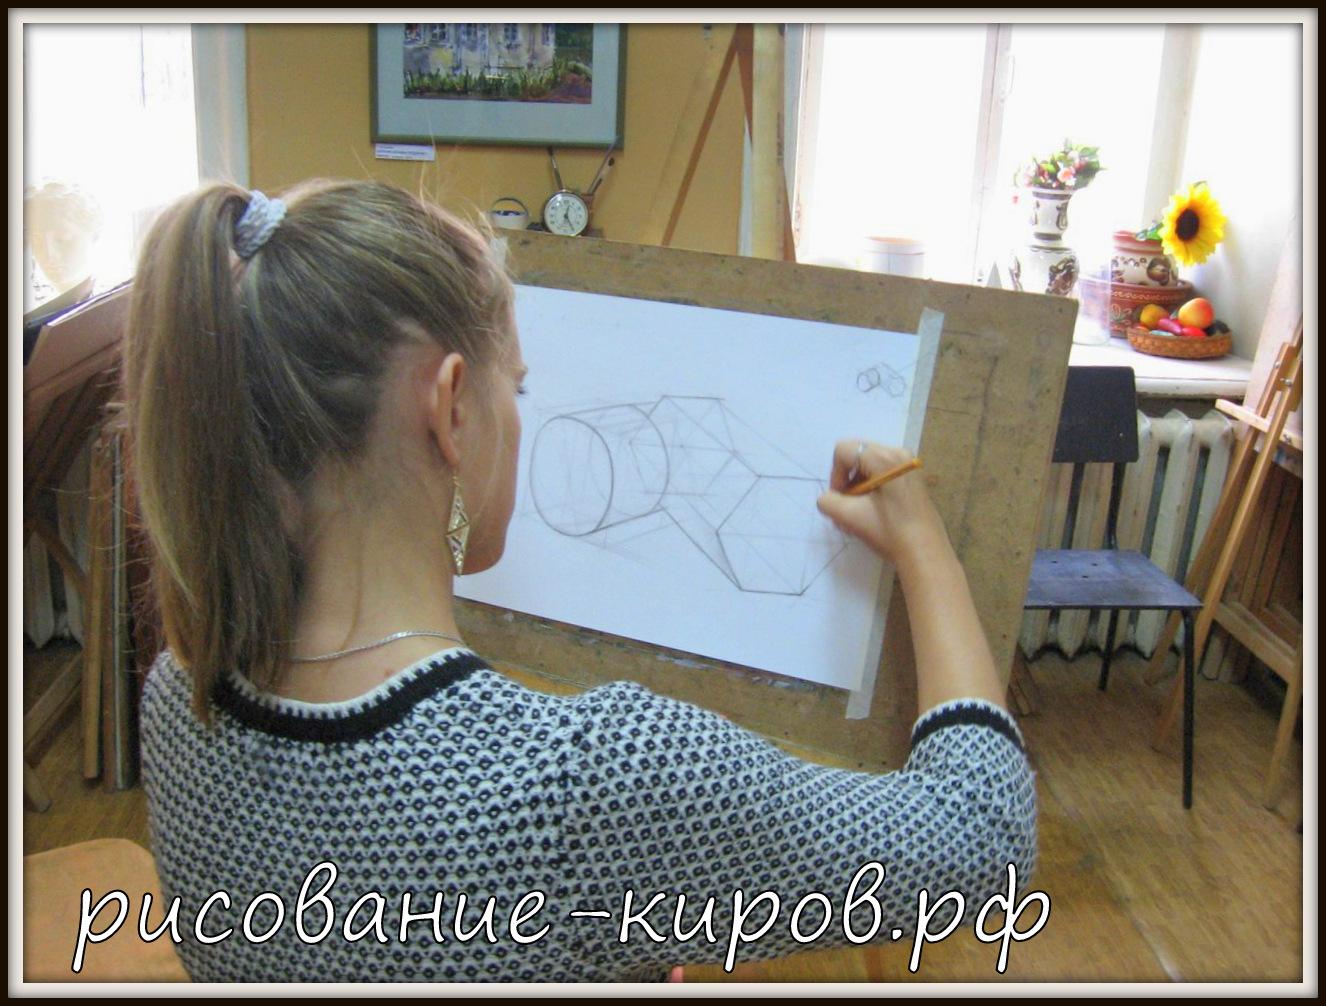 уроки рисования в Кирове